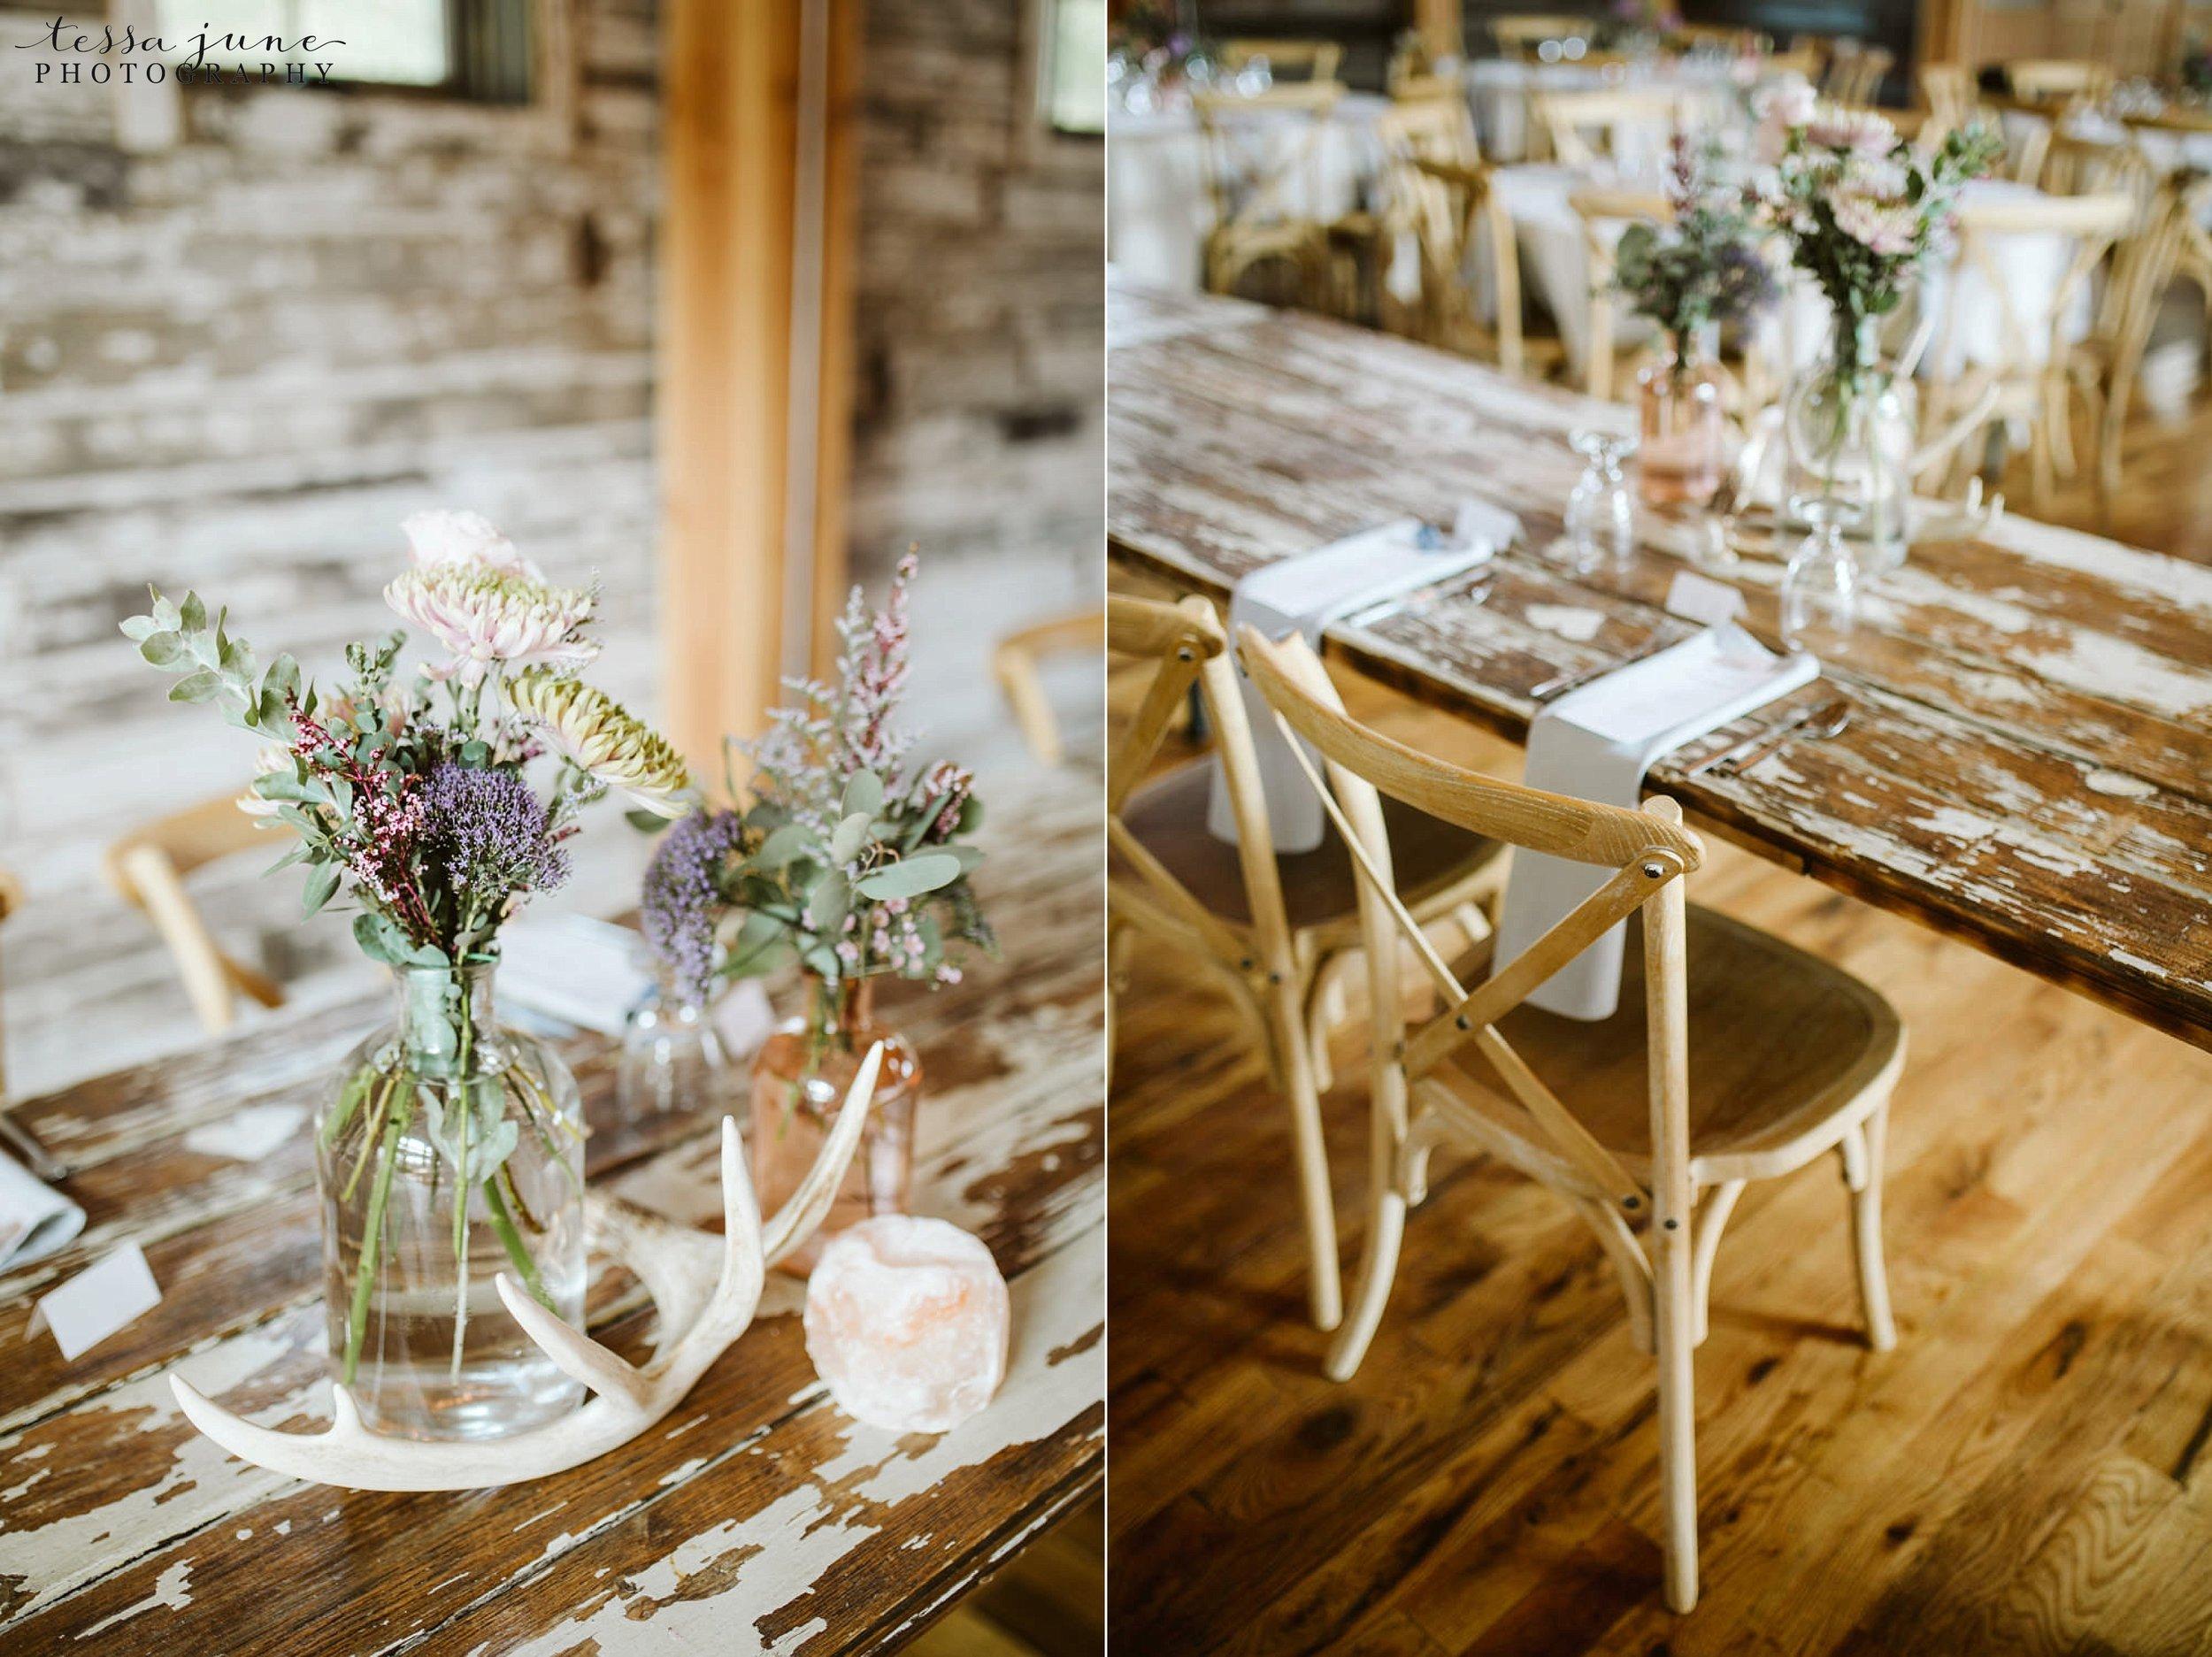 gathered-oaks-barn-wedding-alexandria-minnesota-130.jpg